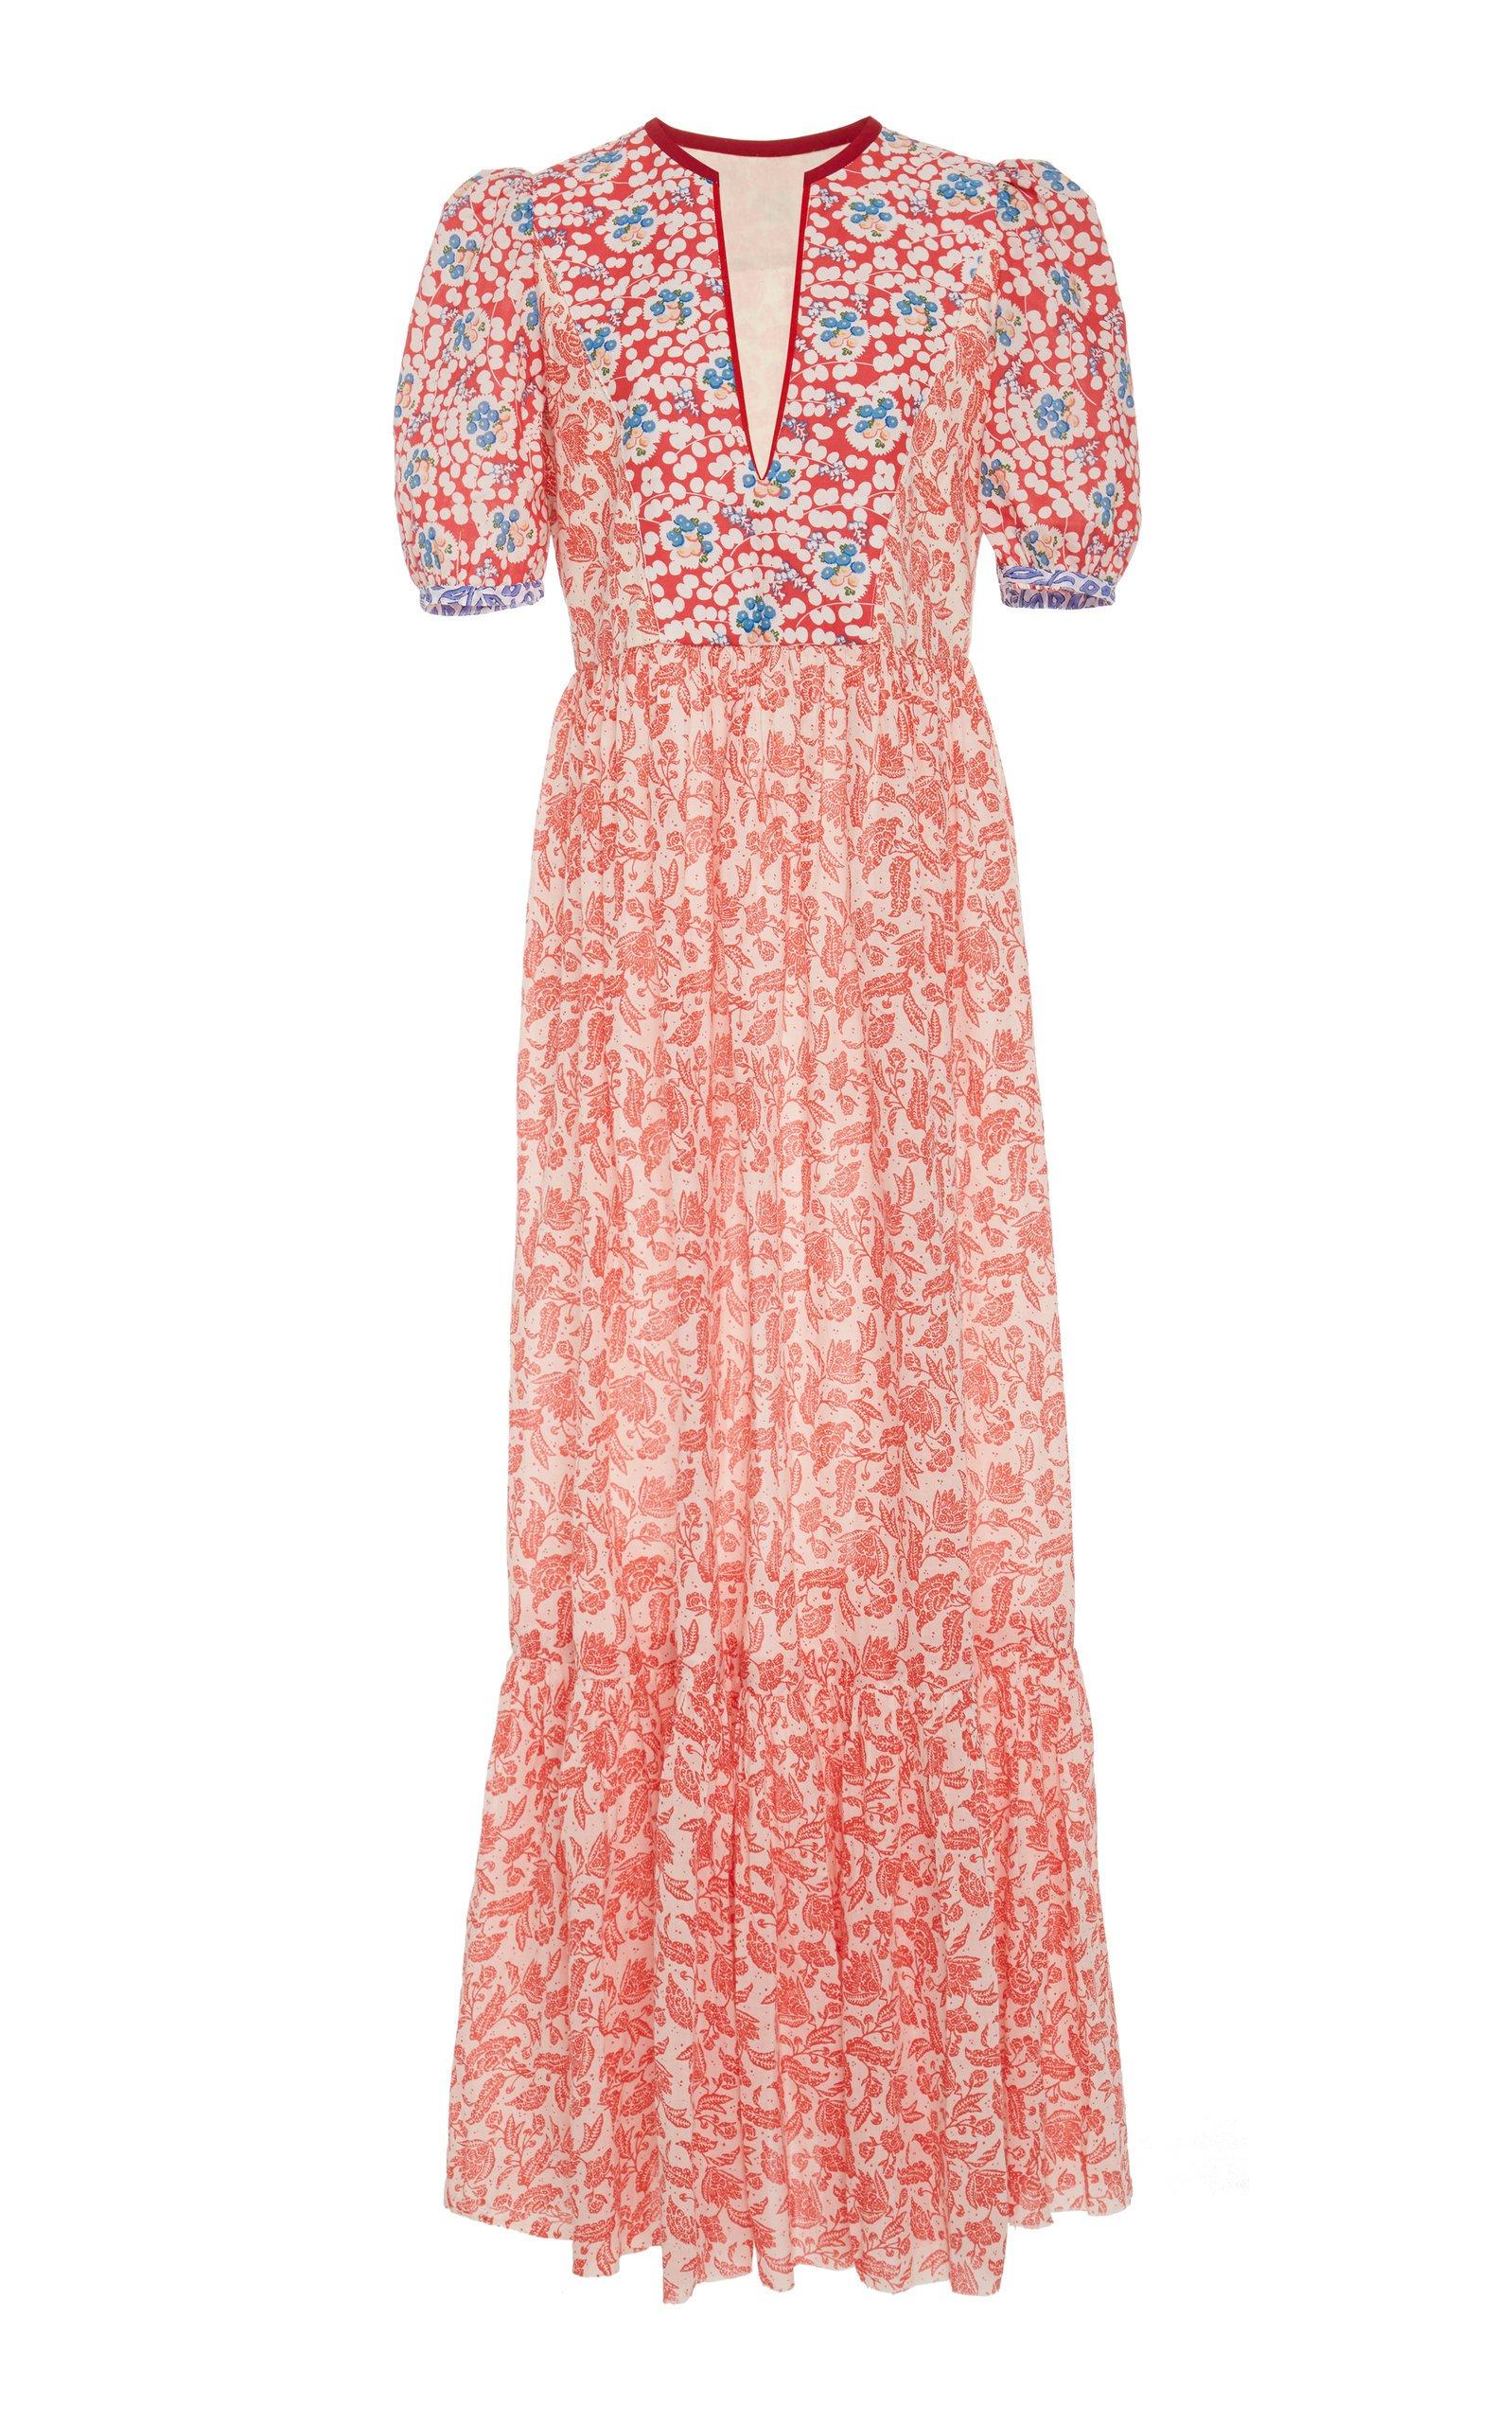 Alix of Bohemia Laetitia Multi-Print Cotton Dress